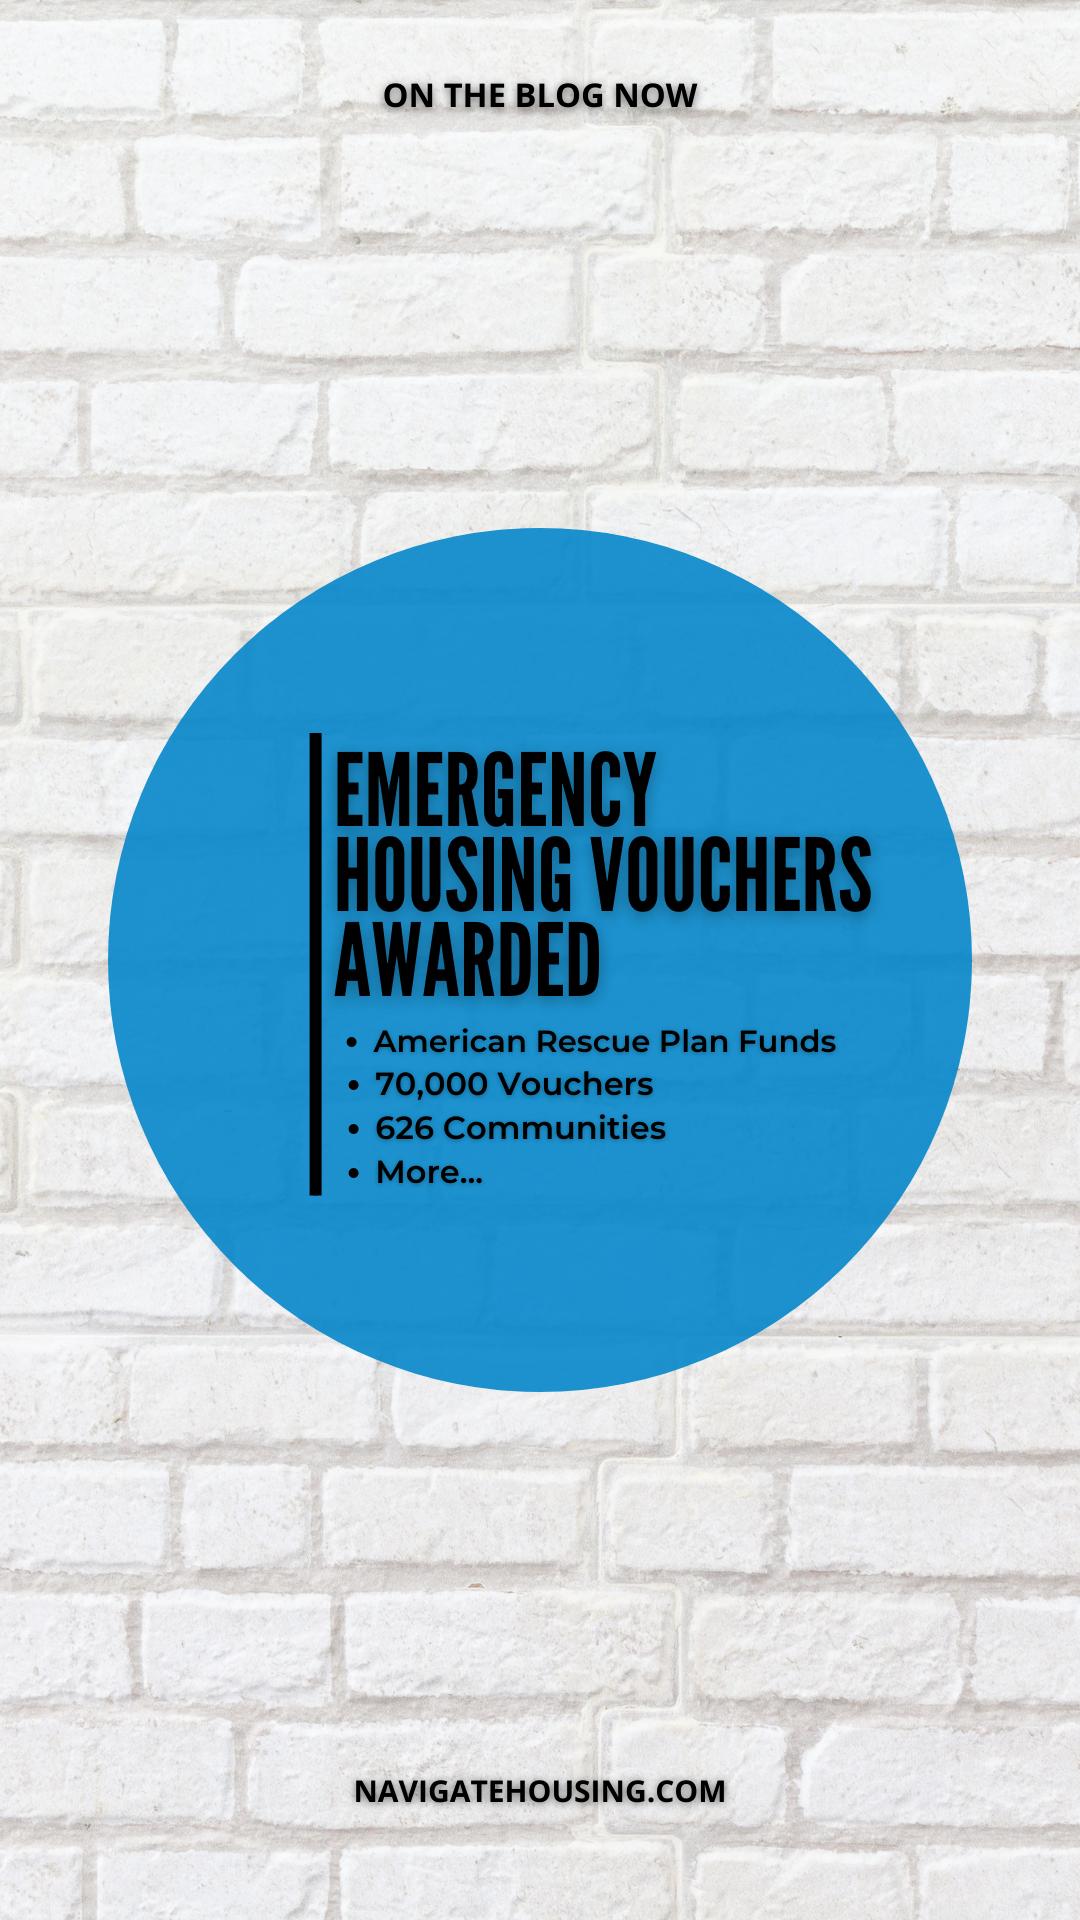 Emergency Housing Vouchers Awarded